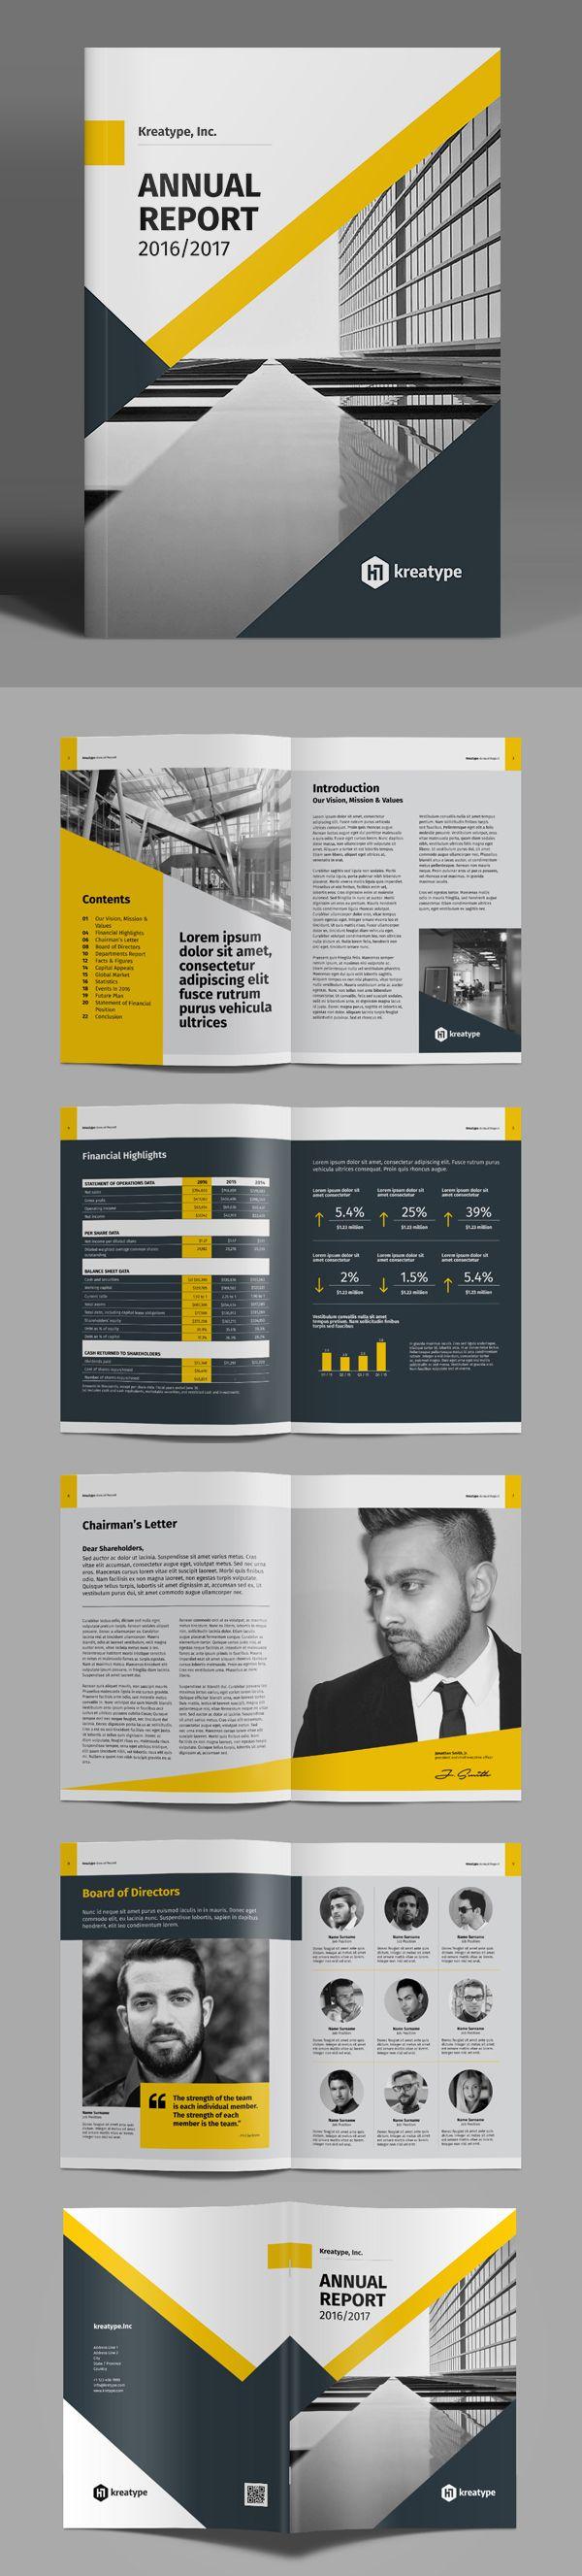 Kreatype Annual Report #annualreport #booklet #brochuredesign #brochuretemplates #fashioncatalog #catalogdesign